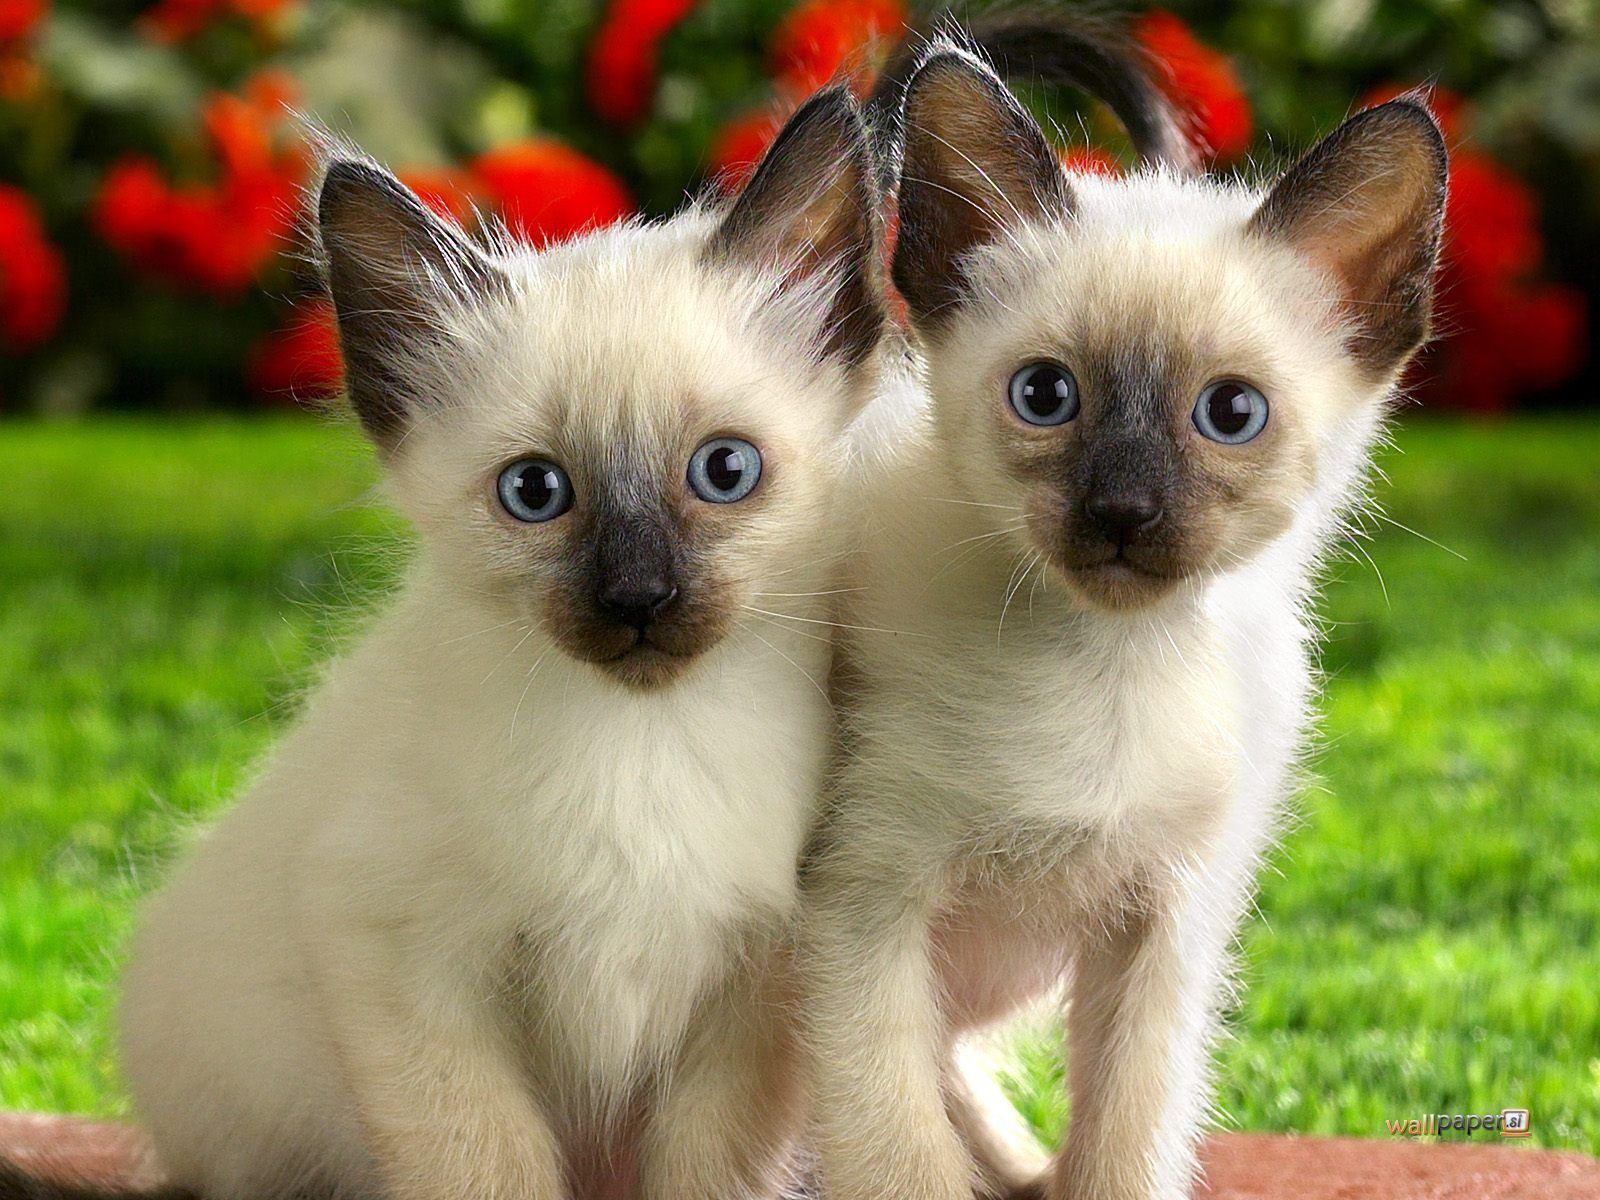 Serrade Petit Kitten: Serrade Siamese Kittens Breed